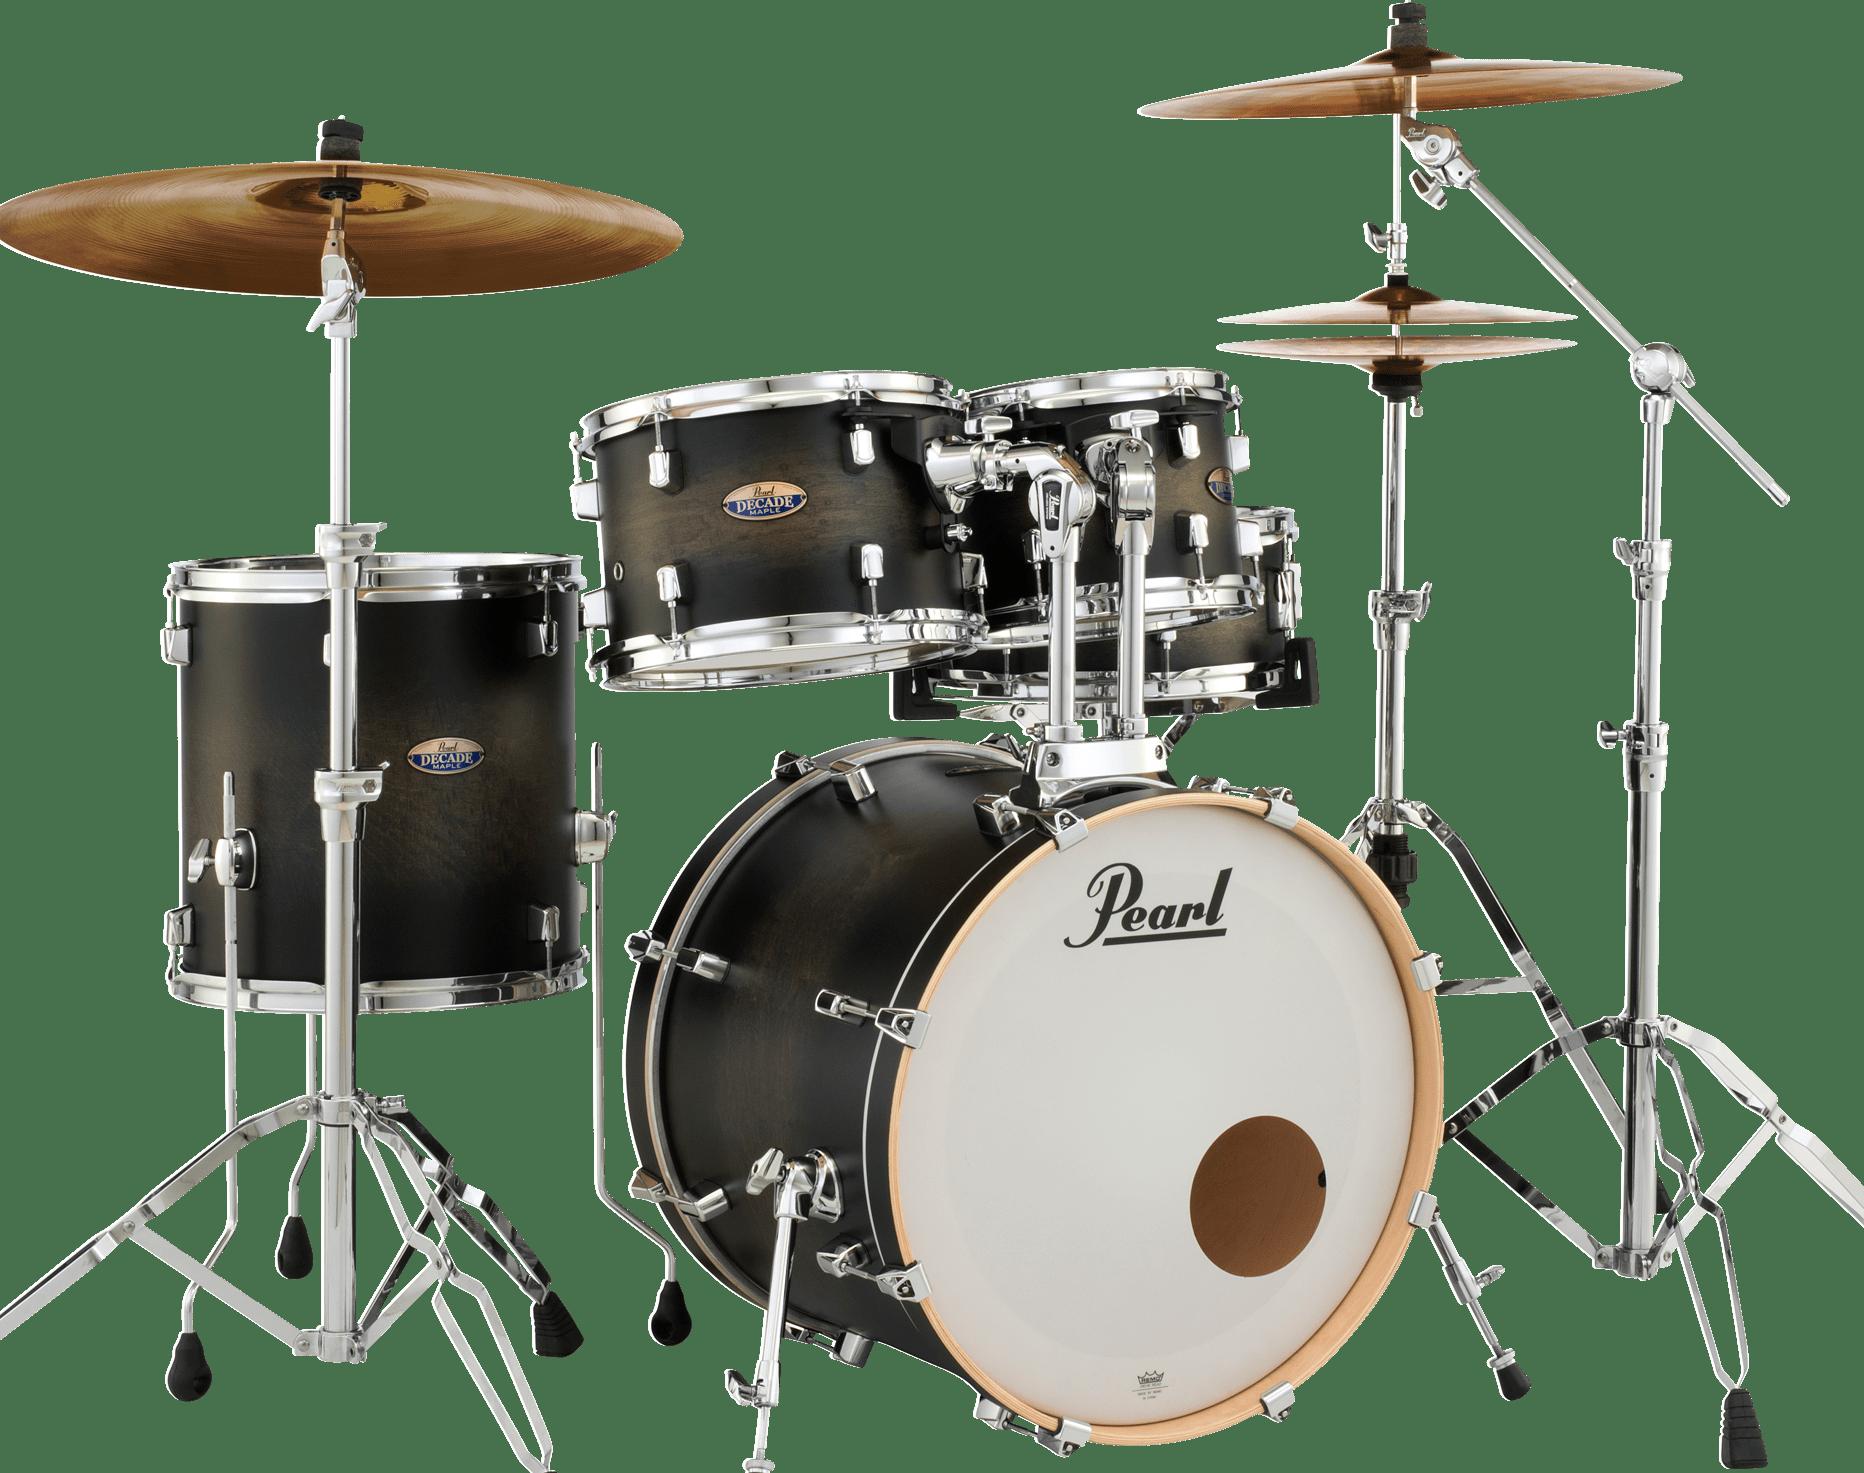 Drum clipart jazz drum. Decade maple